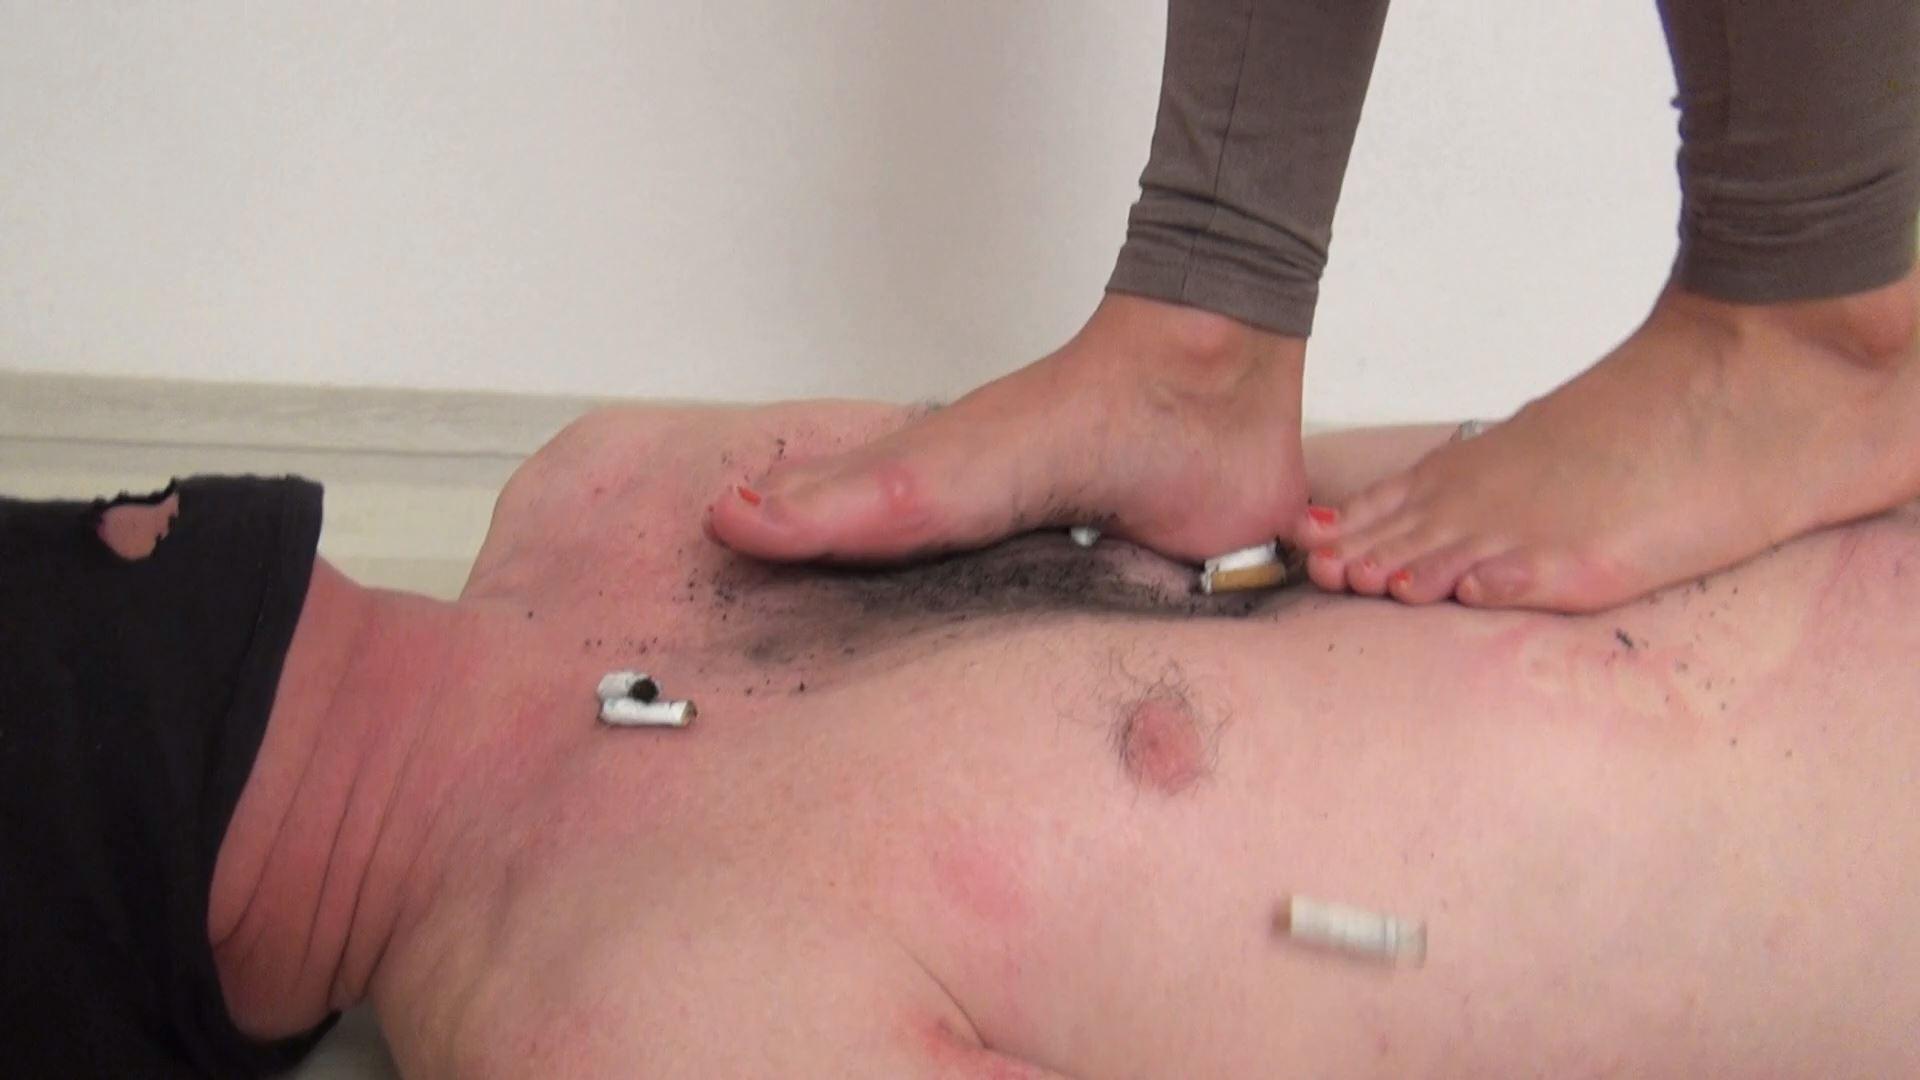 Mistress Candy In Scene: Trampling dirty feet - ABBIECATFETISH - FULL HD/1080p/MP4